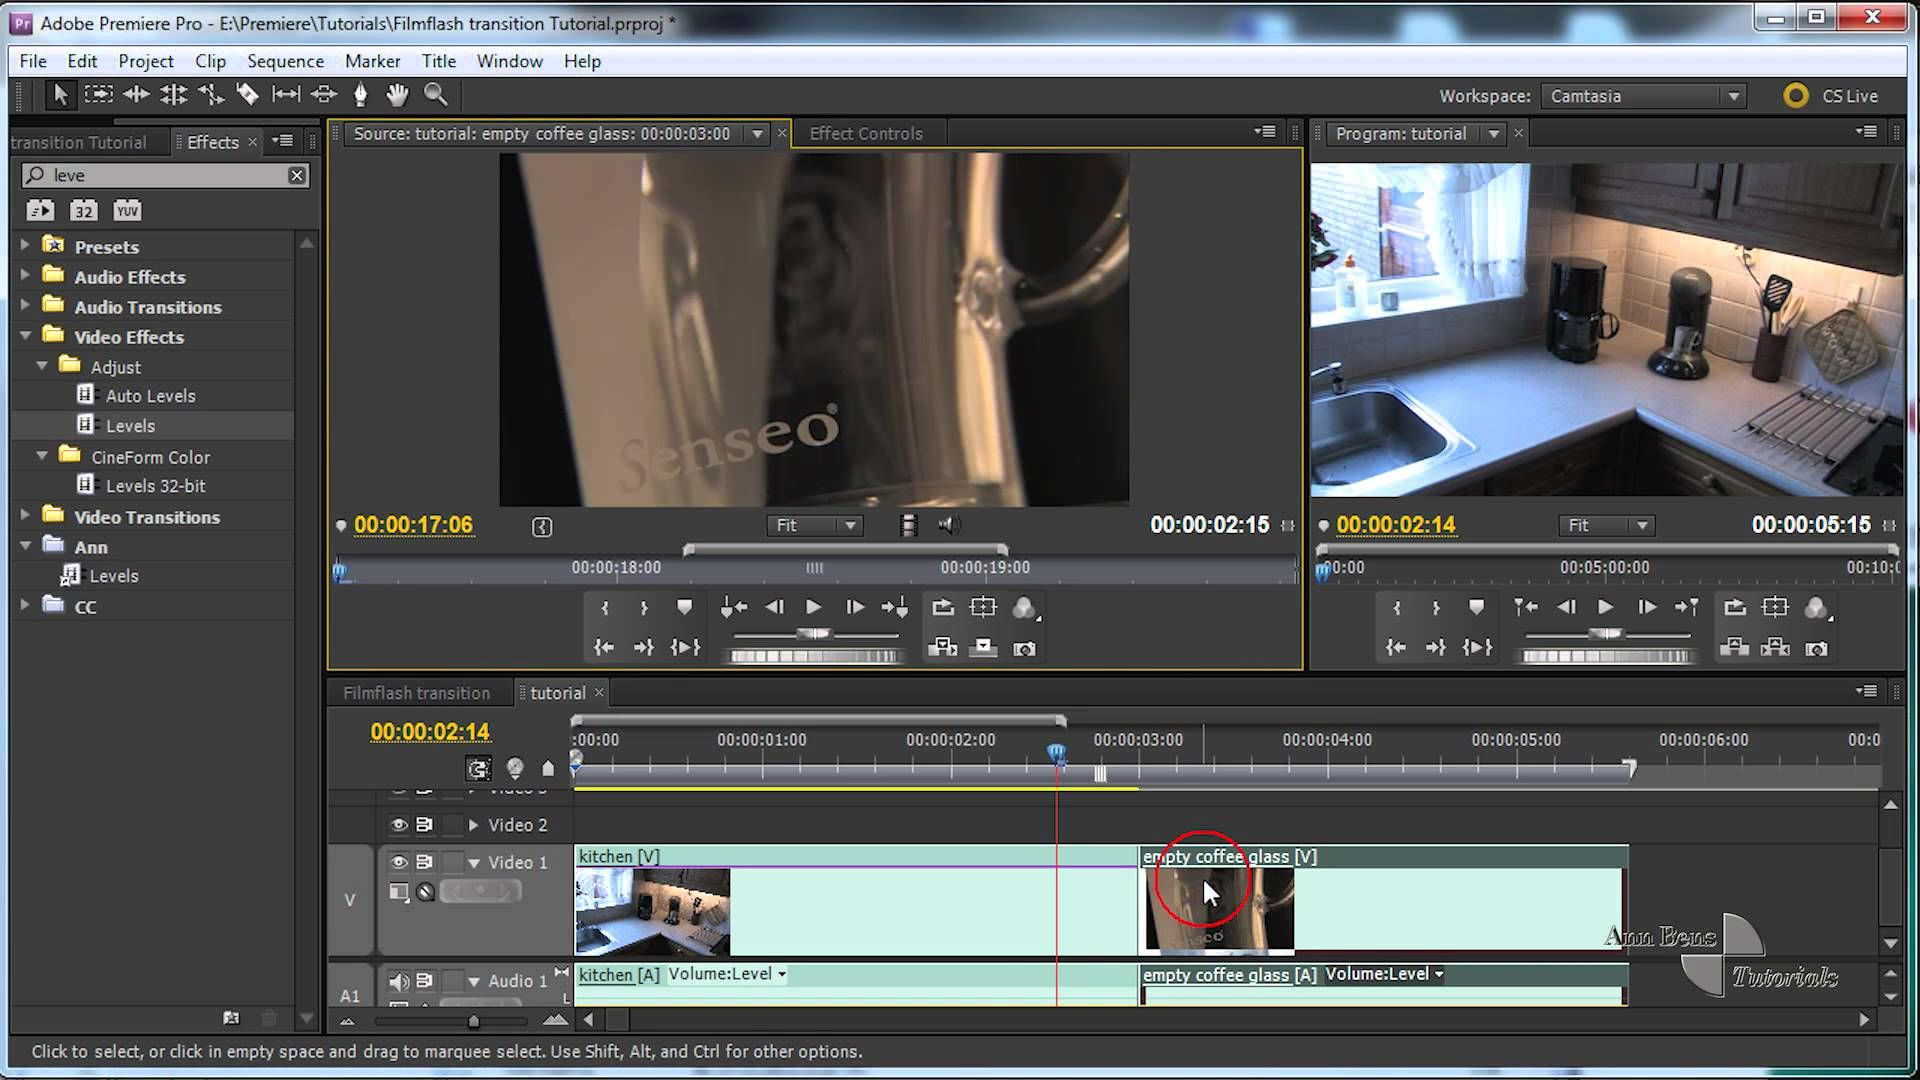 Filmflash Transition Premiere Pro Premiere Pro Video Marketing Video Editing